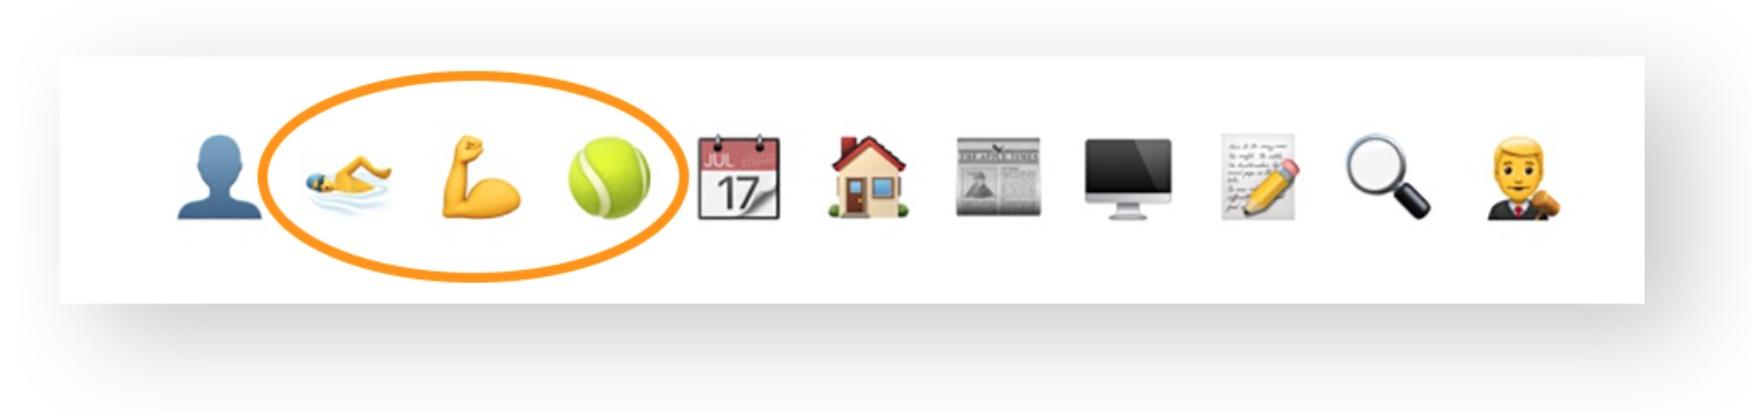 pooldues top bar grid icons